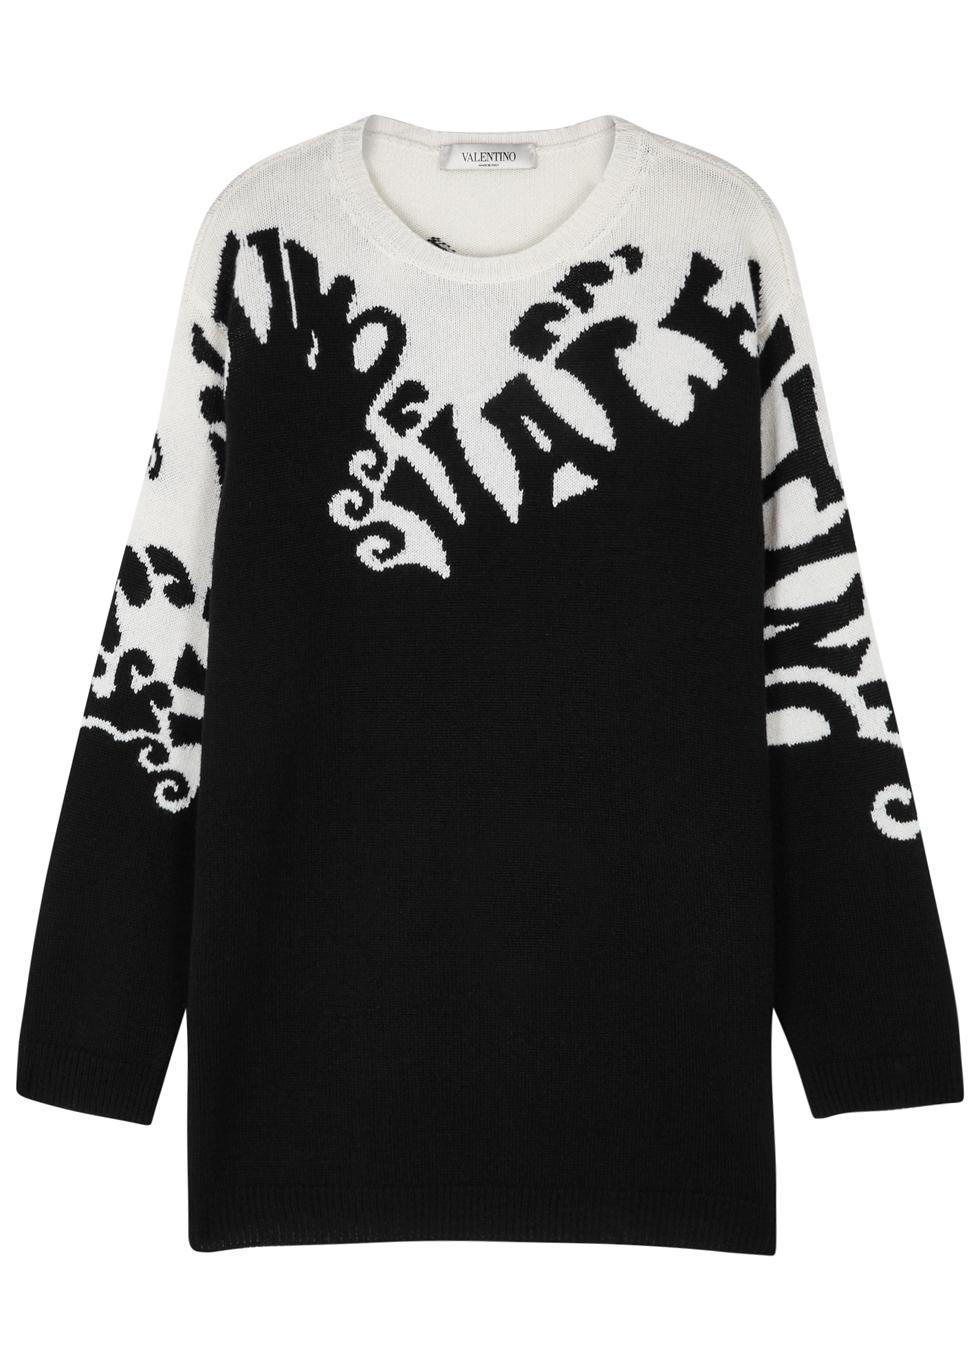 Logo Intarsia Cashmere Knit Sweater, Black And White